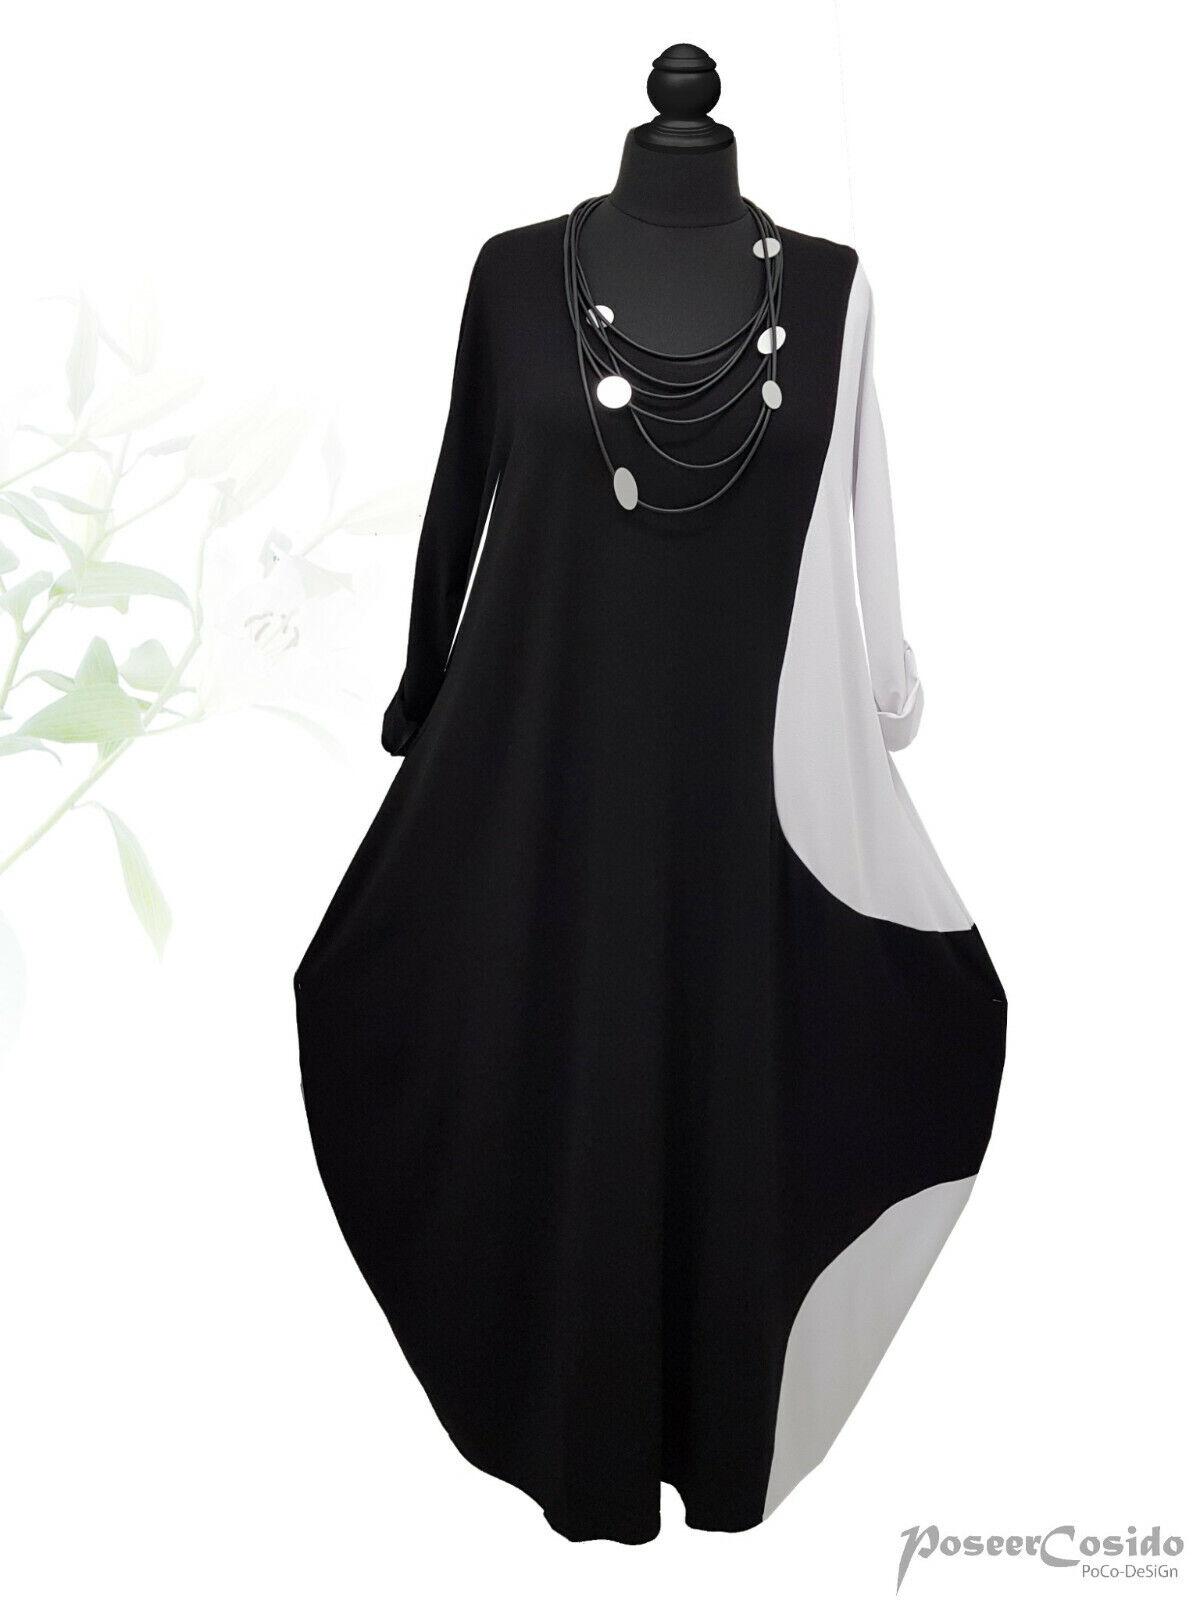 PoCo LAGENLOOK Ballon-Kleid 44 46 48 50 52 54 56 58 L-XL-XXL-XXXL schwarz weiß